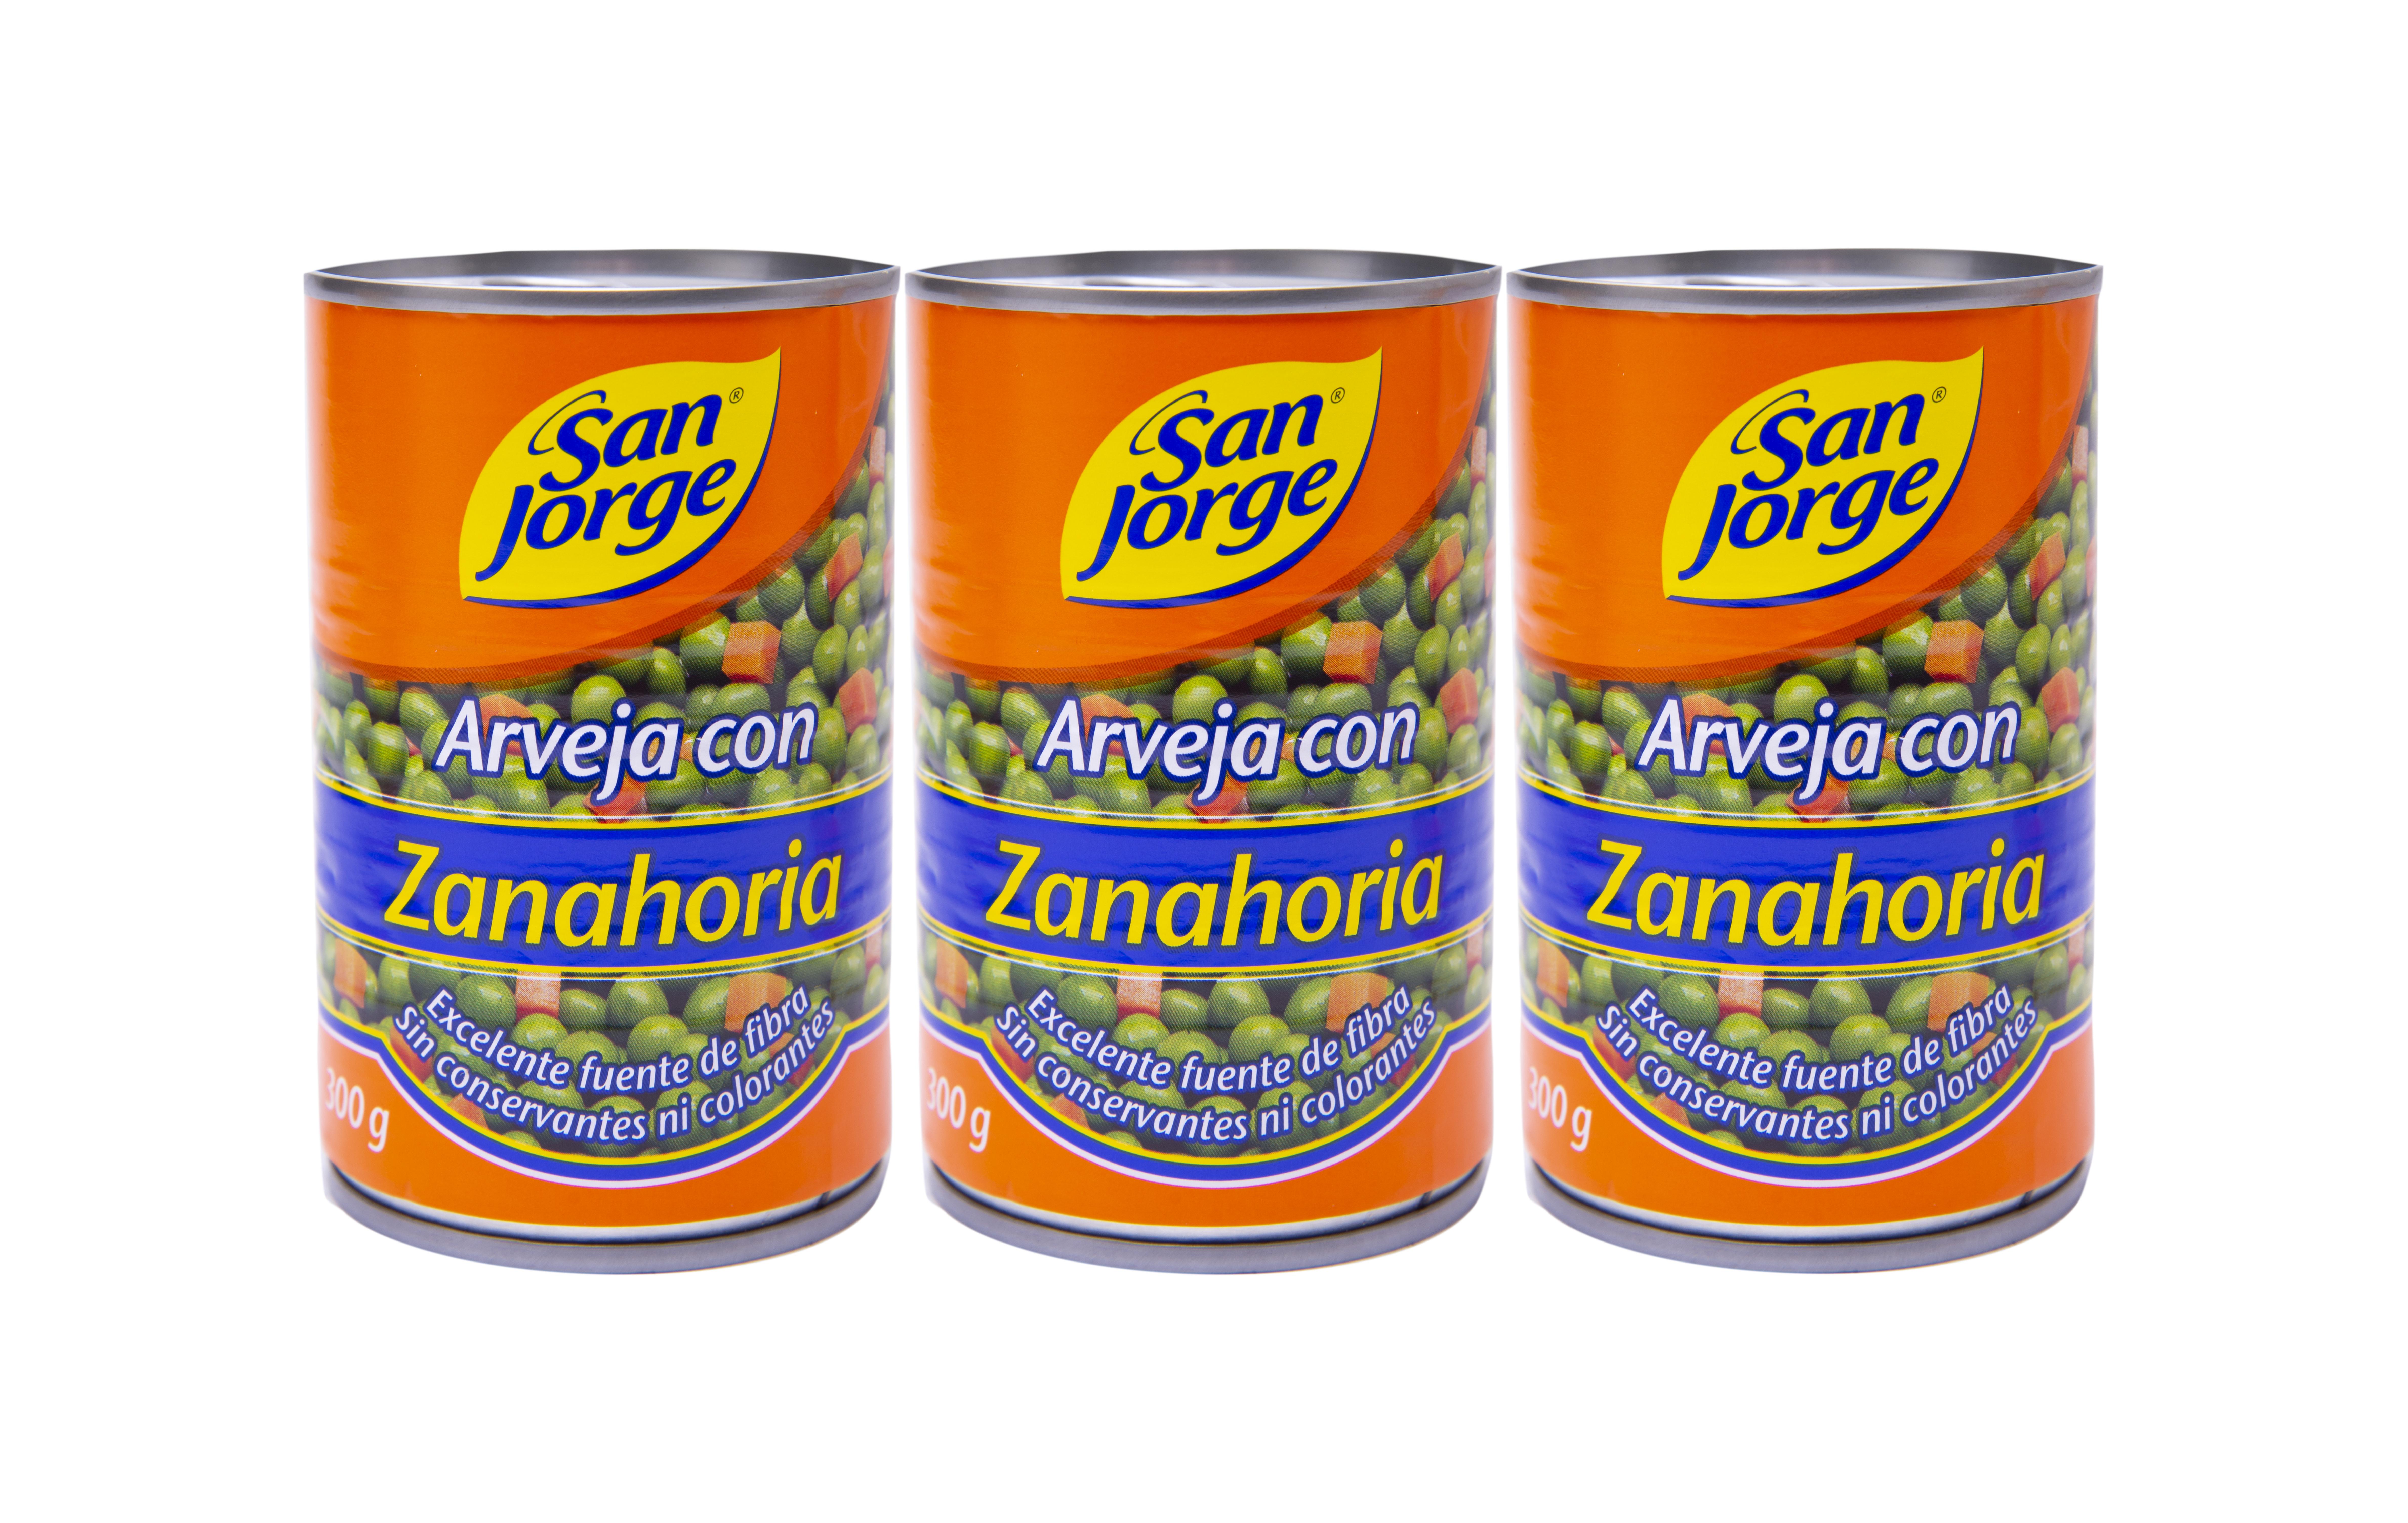 Arveja con Zanahoria Sanjorge 300g x3